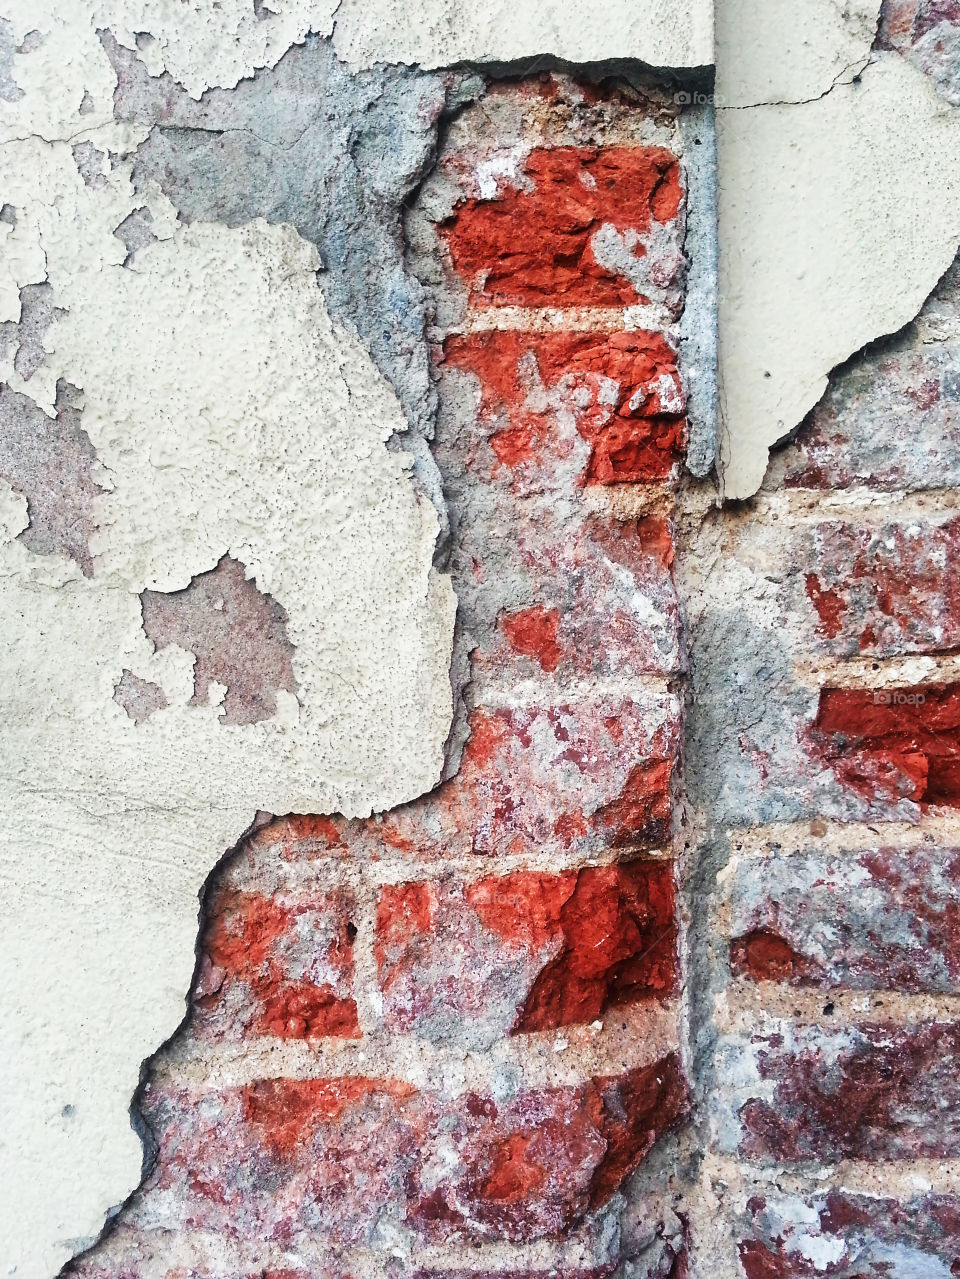 Cracked brick wall background